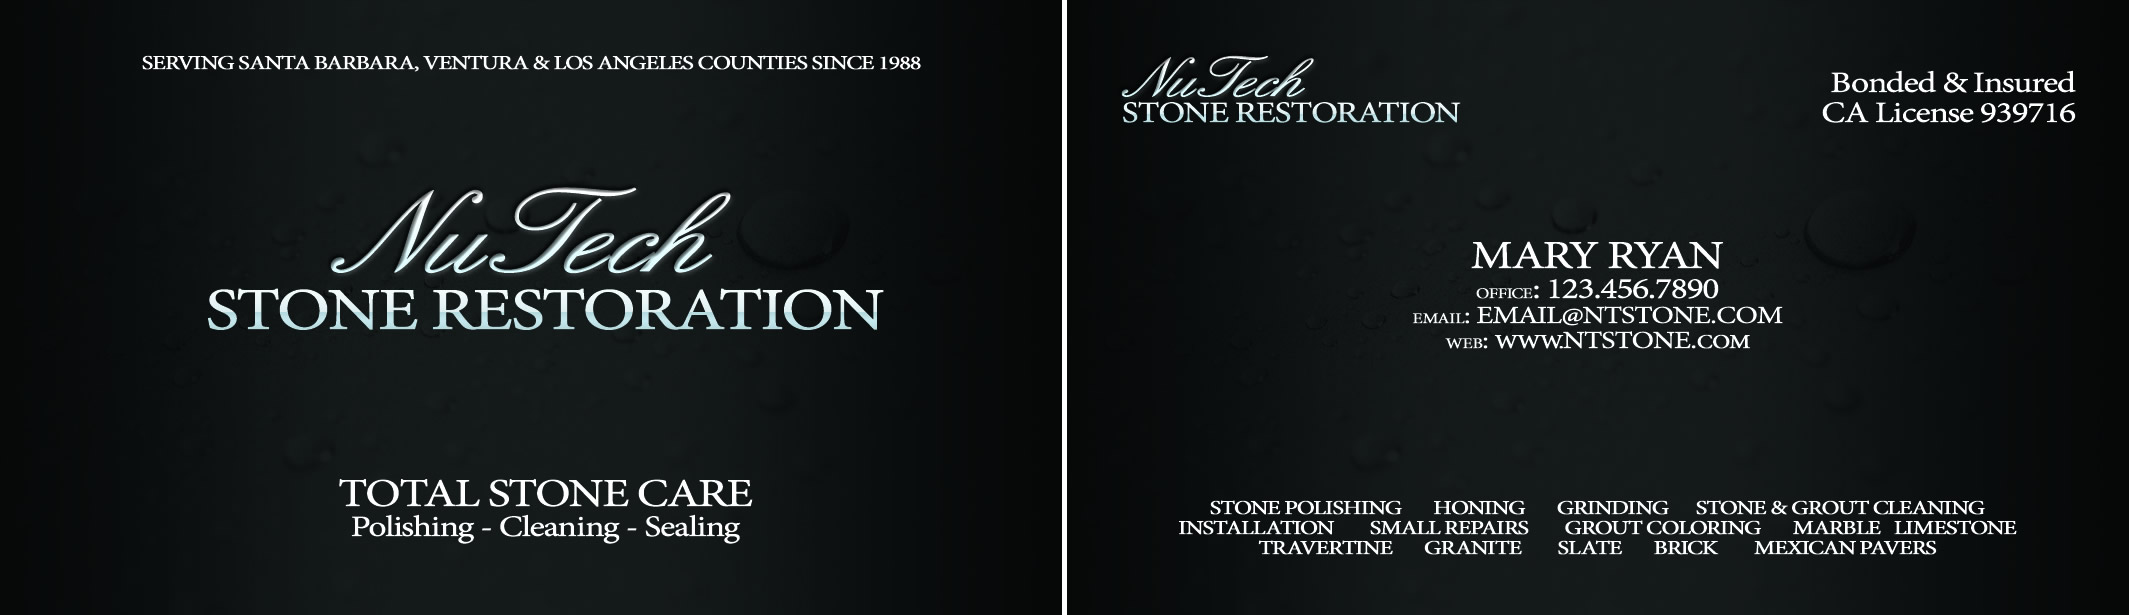 NuTech Stone Business Card Design